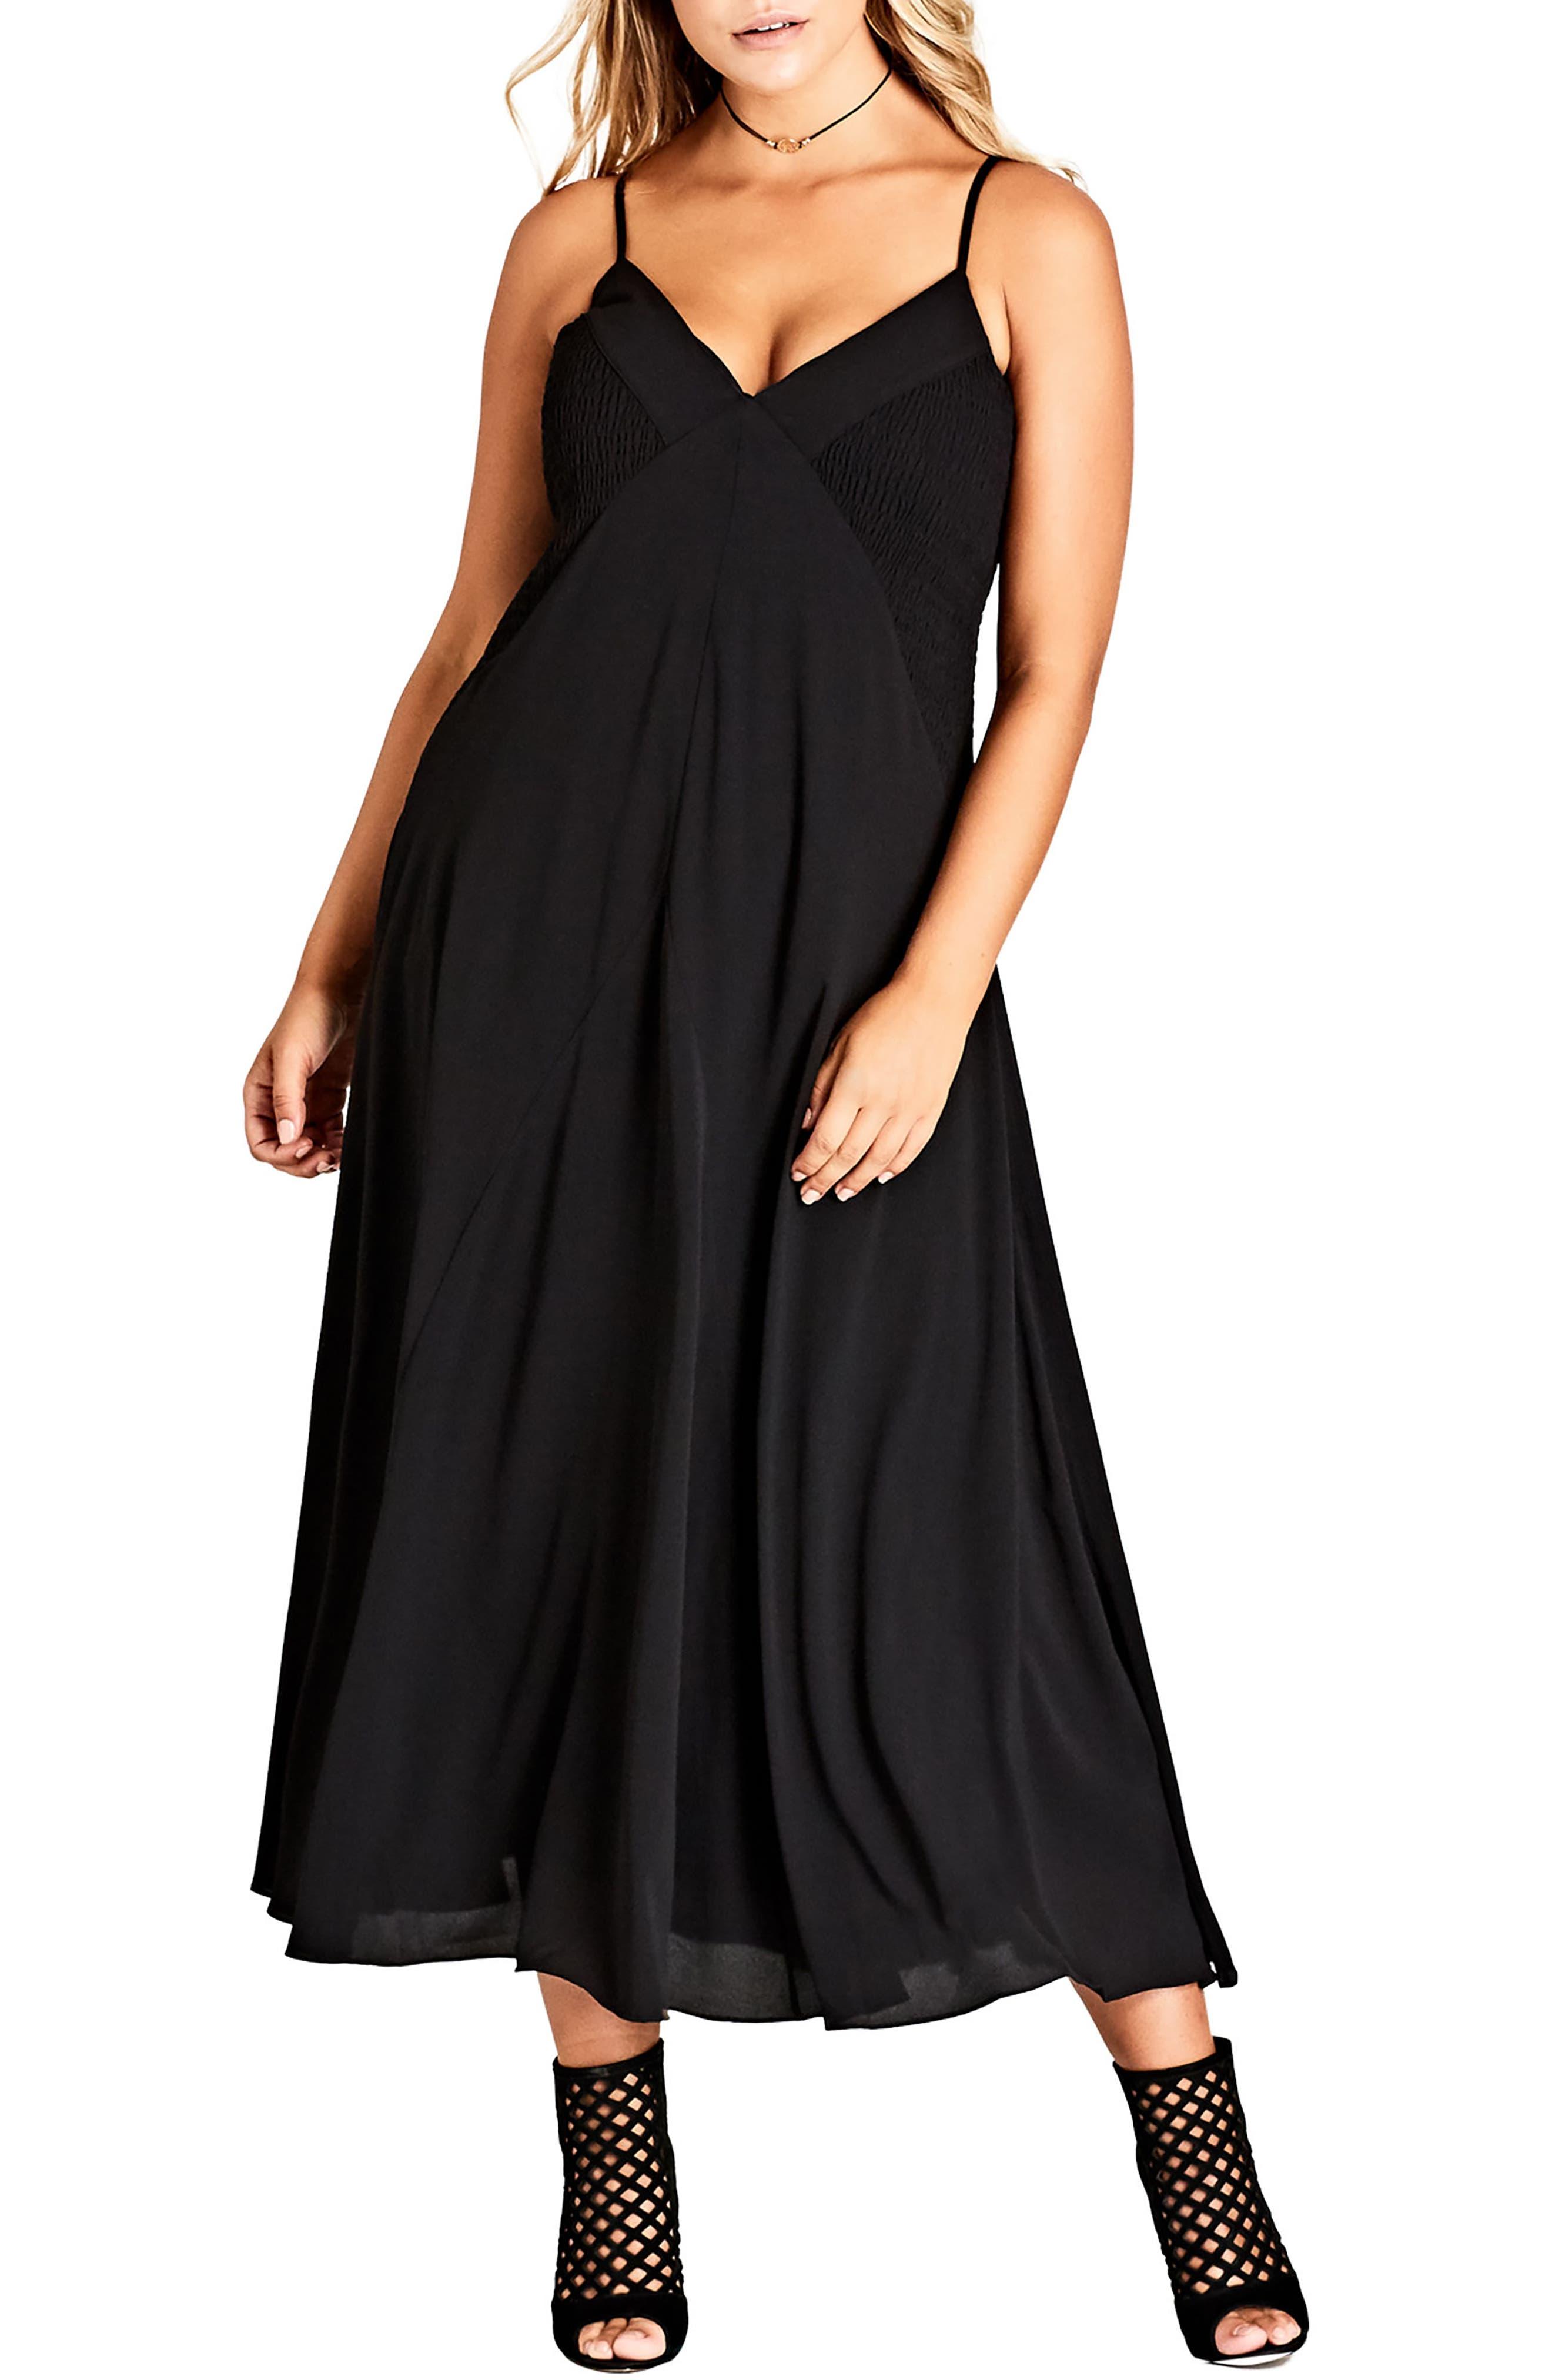 Plus Size City Chic Boho Chic Maxi Dress, Black